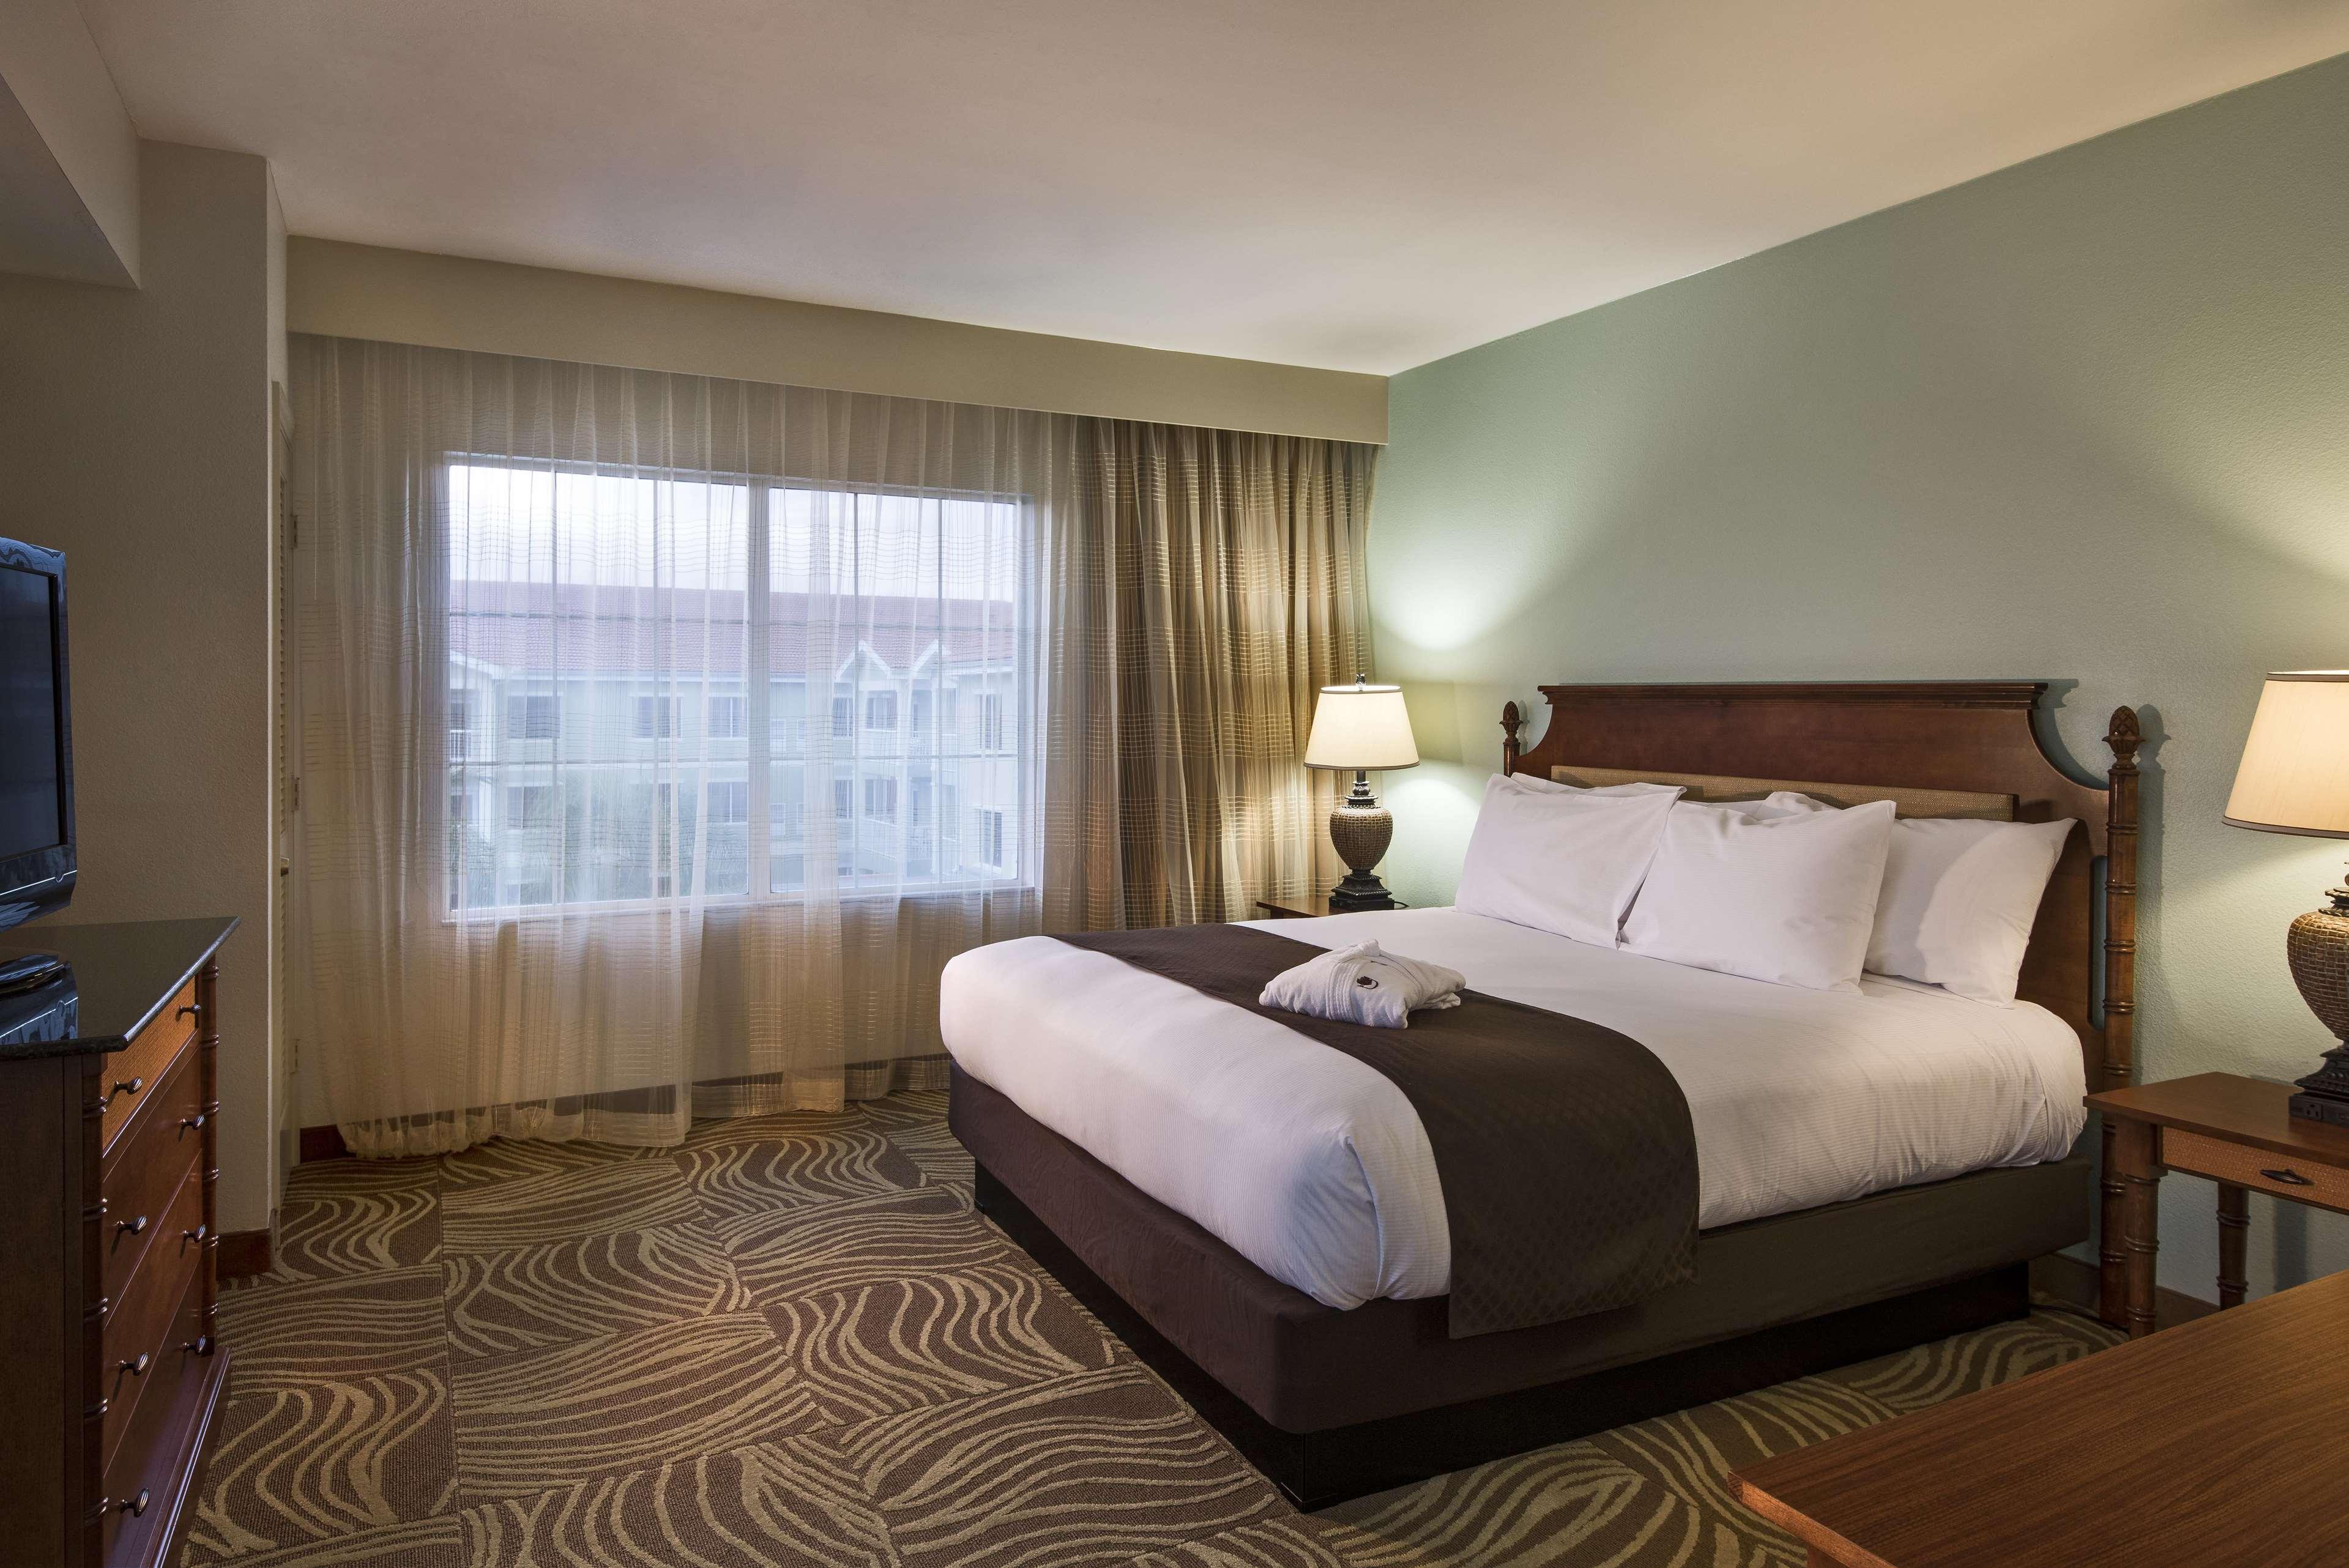 DoubleTree Suites by Hilton Hotel Naples image 27